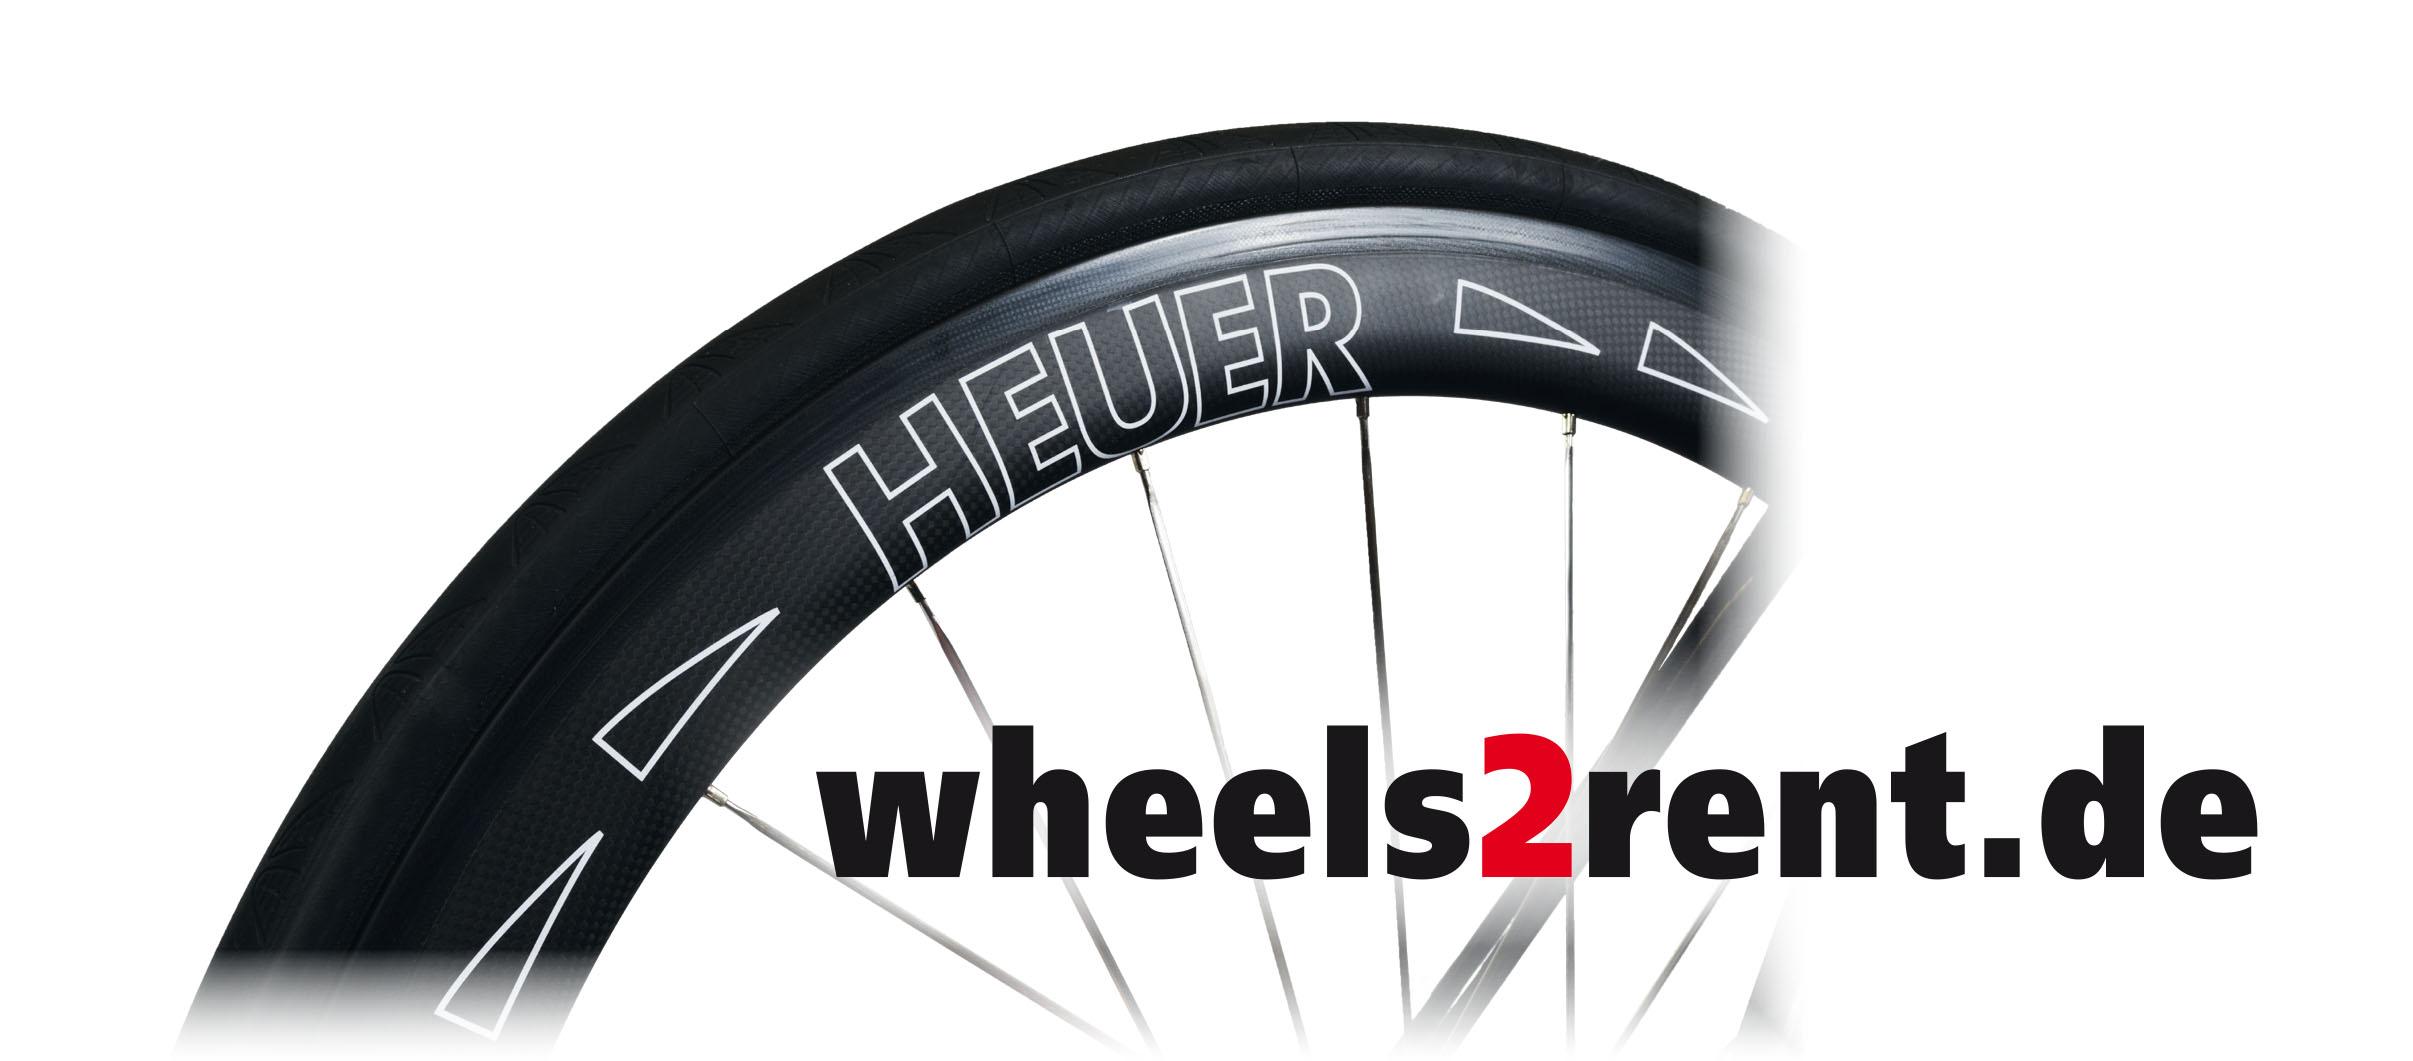 Wheels2rent ist wheels to rent